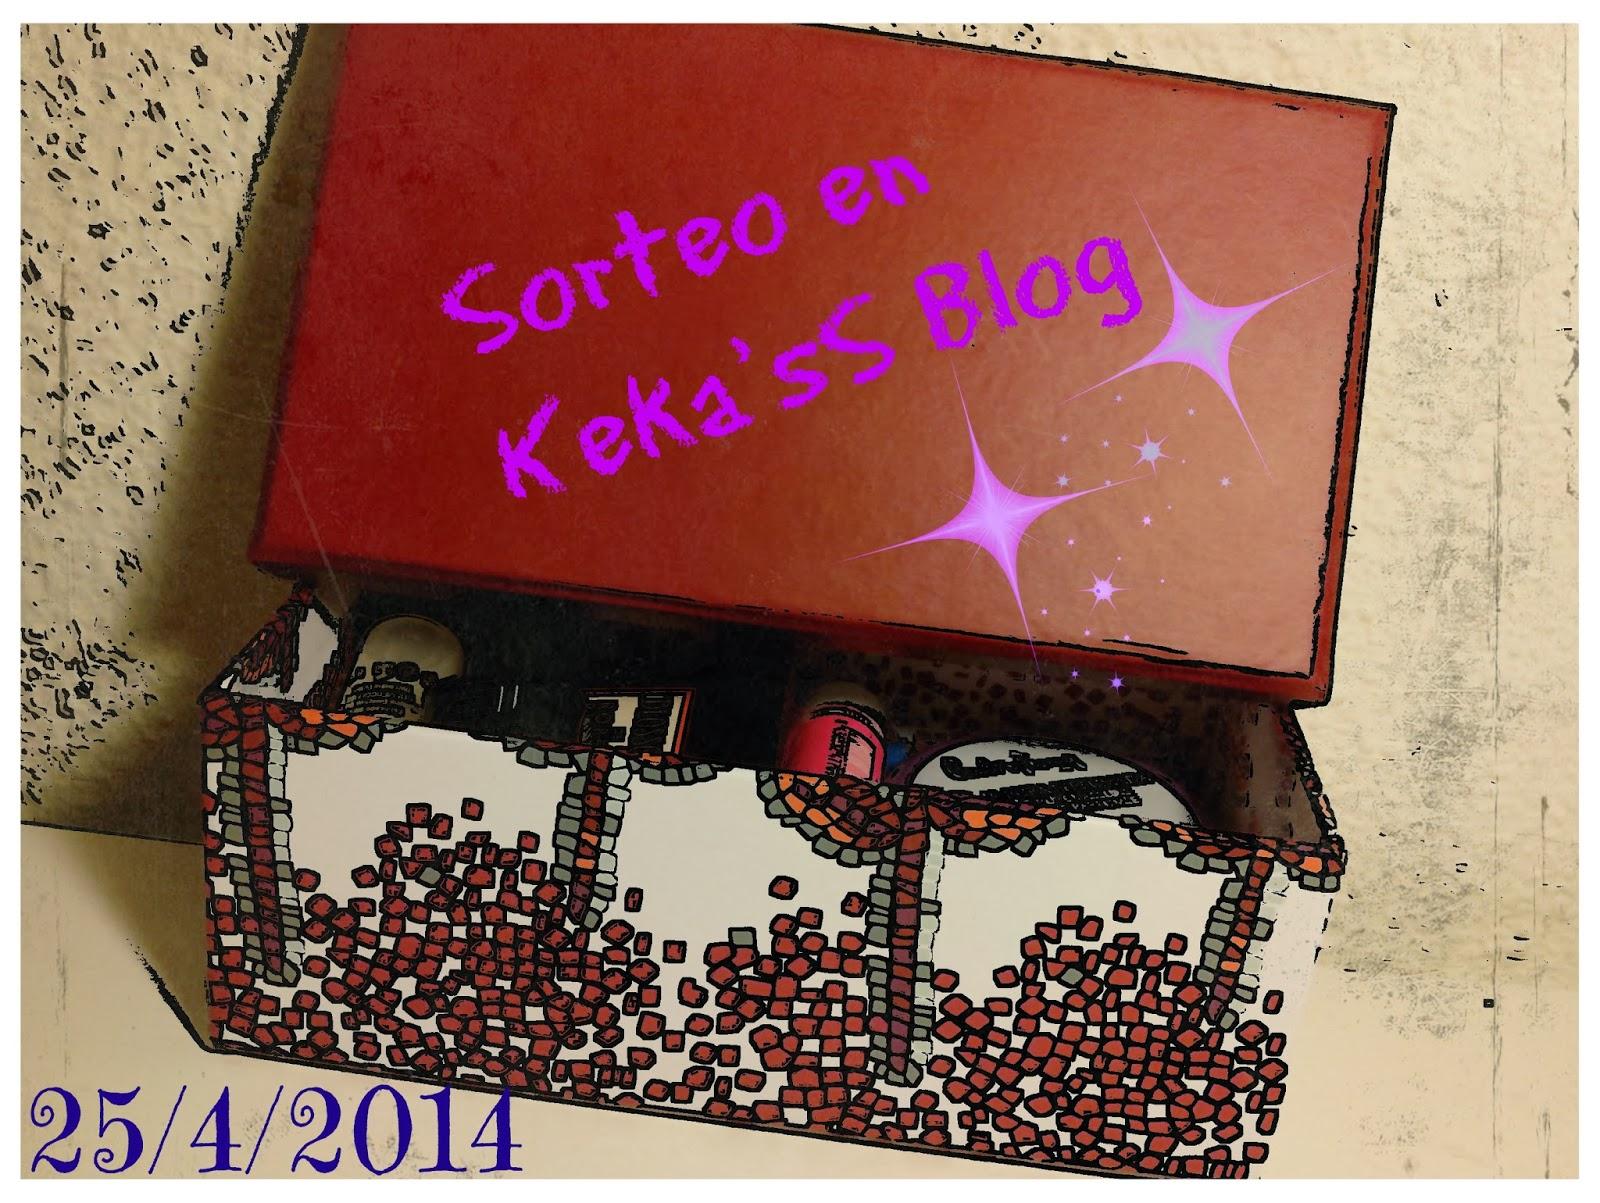 Sorteo Keka'sS Blog :)